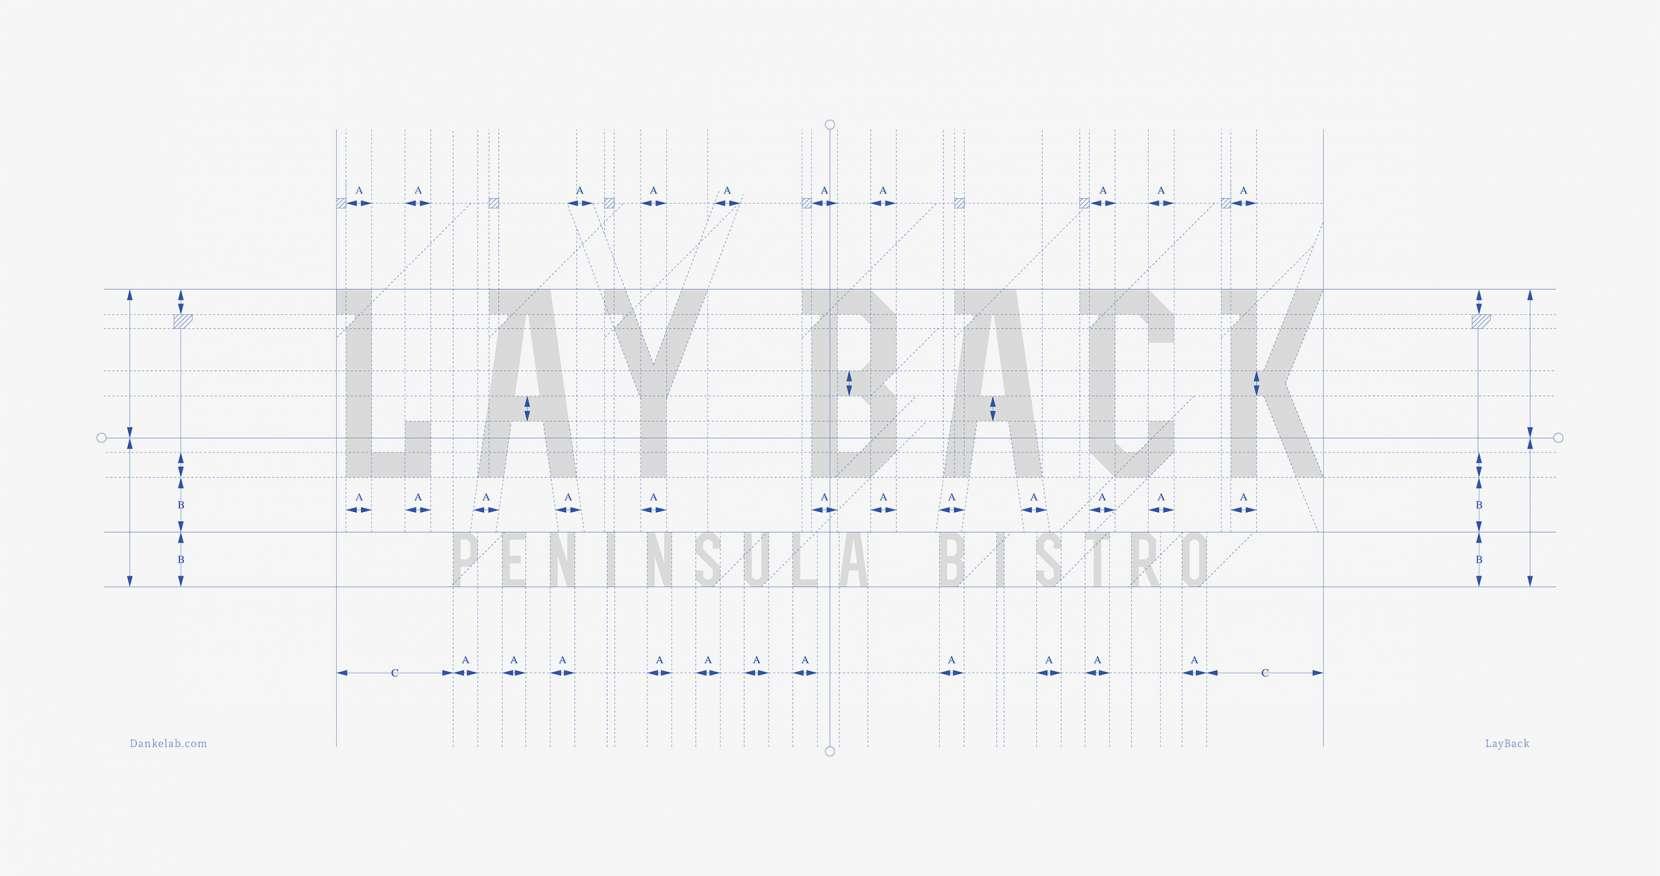 dankelab_layback_01